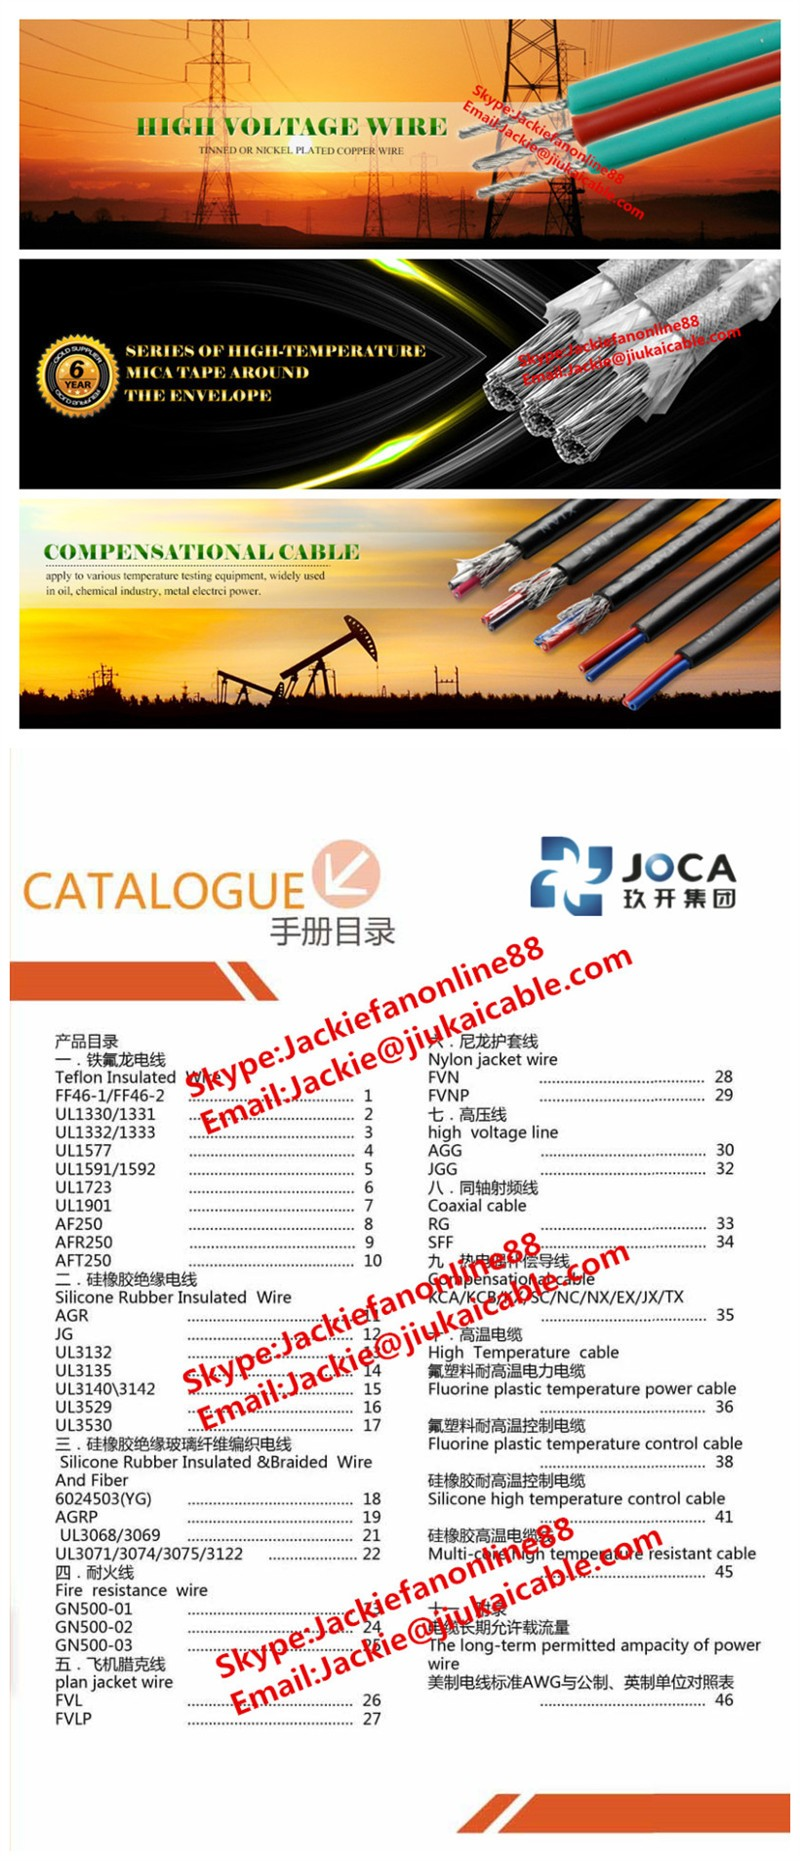 Ul 3219 High Temperature Silicone Insulated Nichrome Heating Wire ...